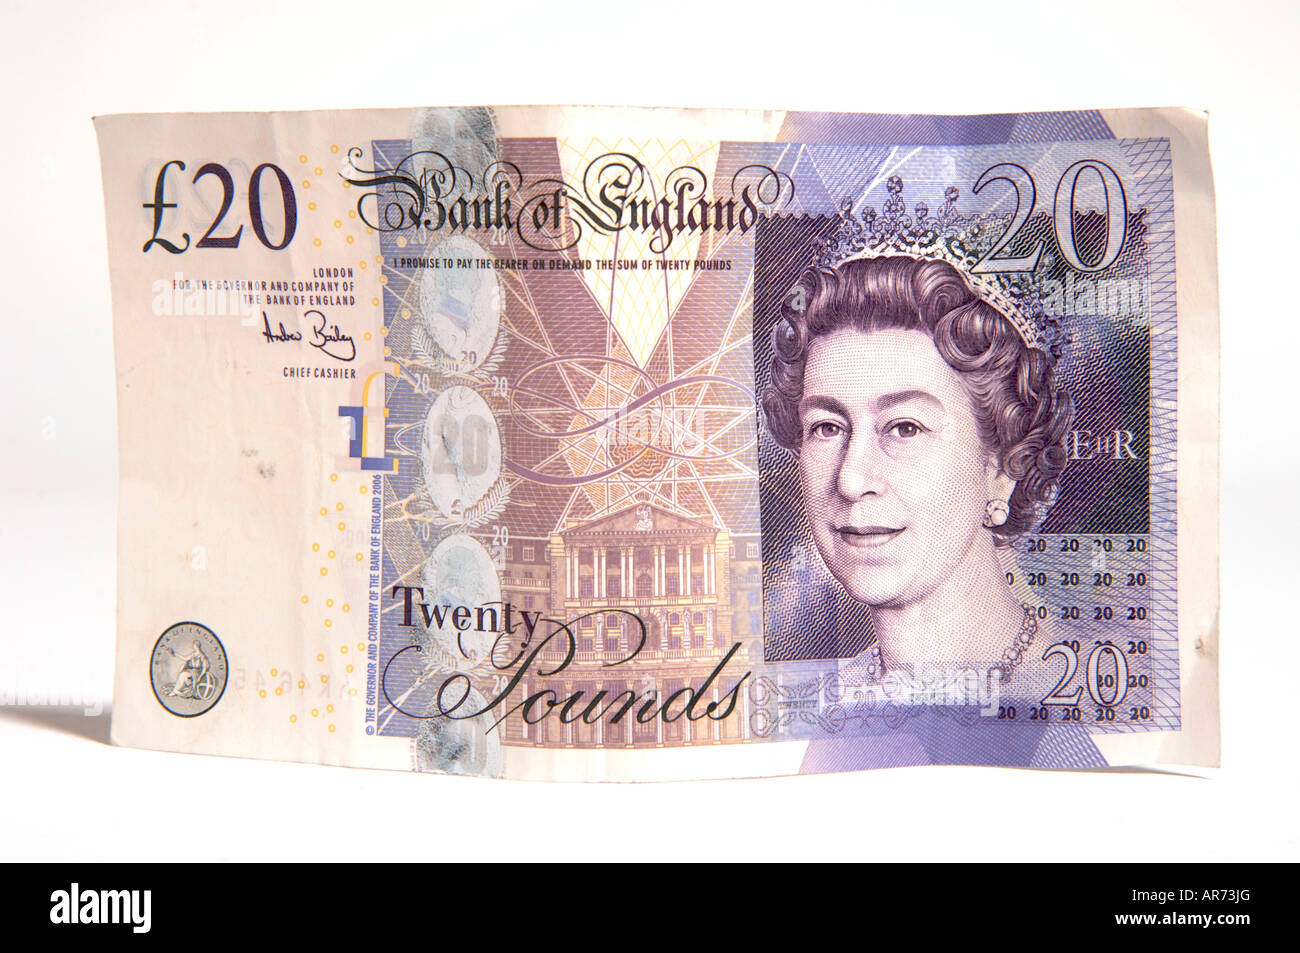 Twenty pound note - Stock Image